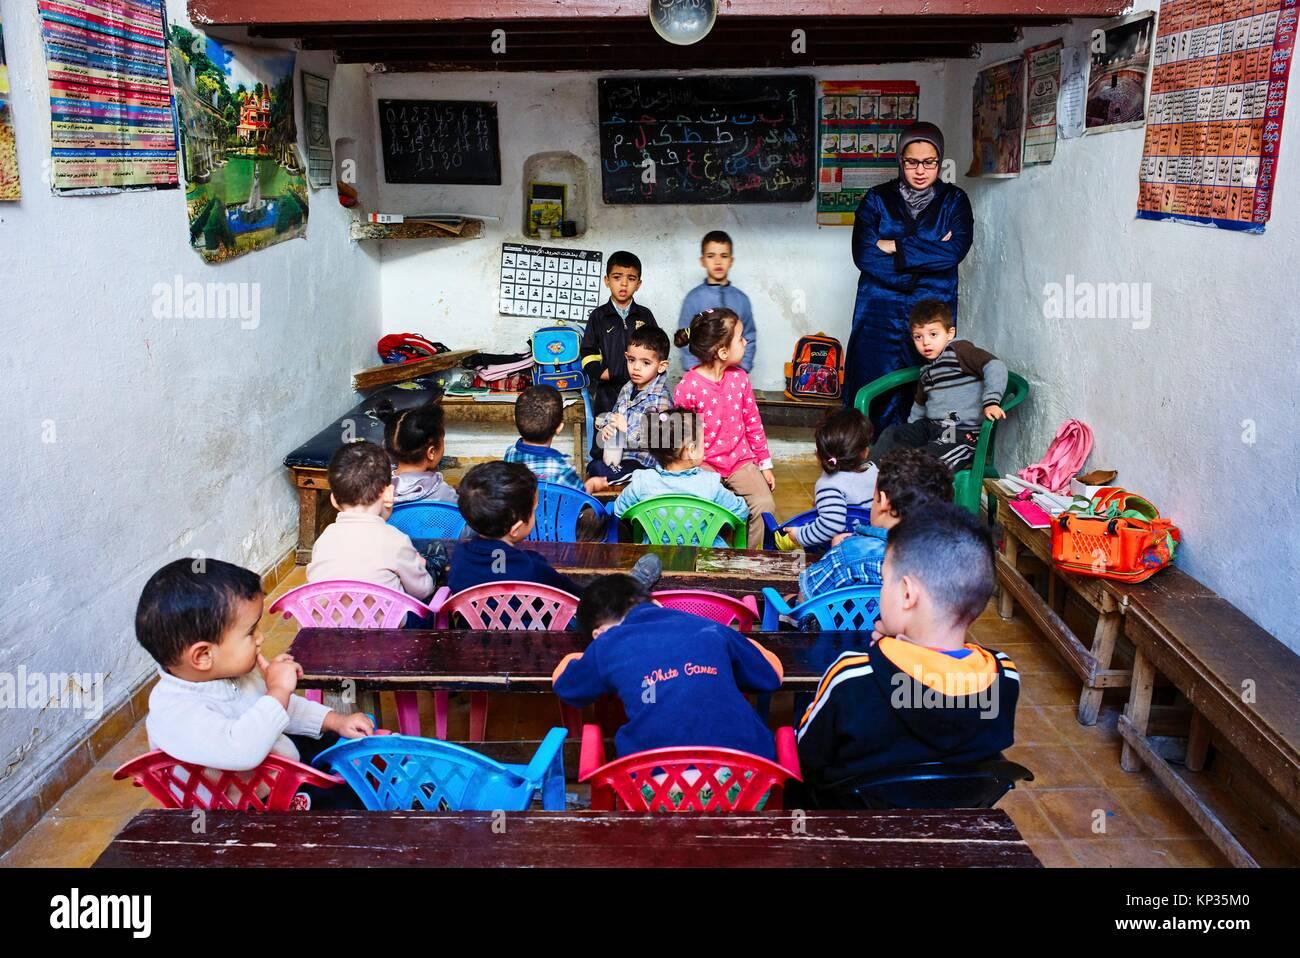 A kindergarten in the medina of Fez, Morocco - Stock Image